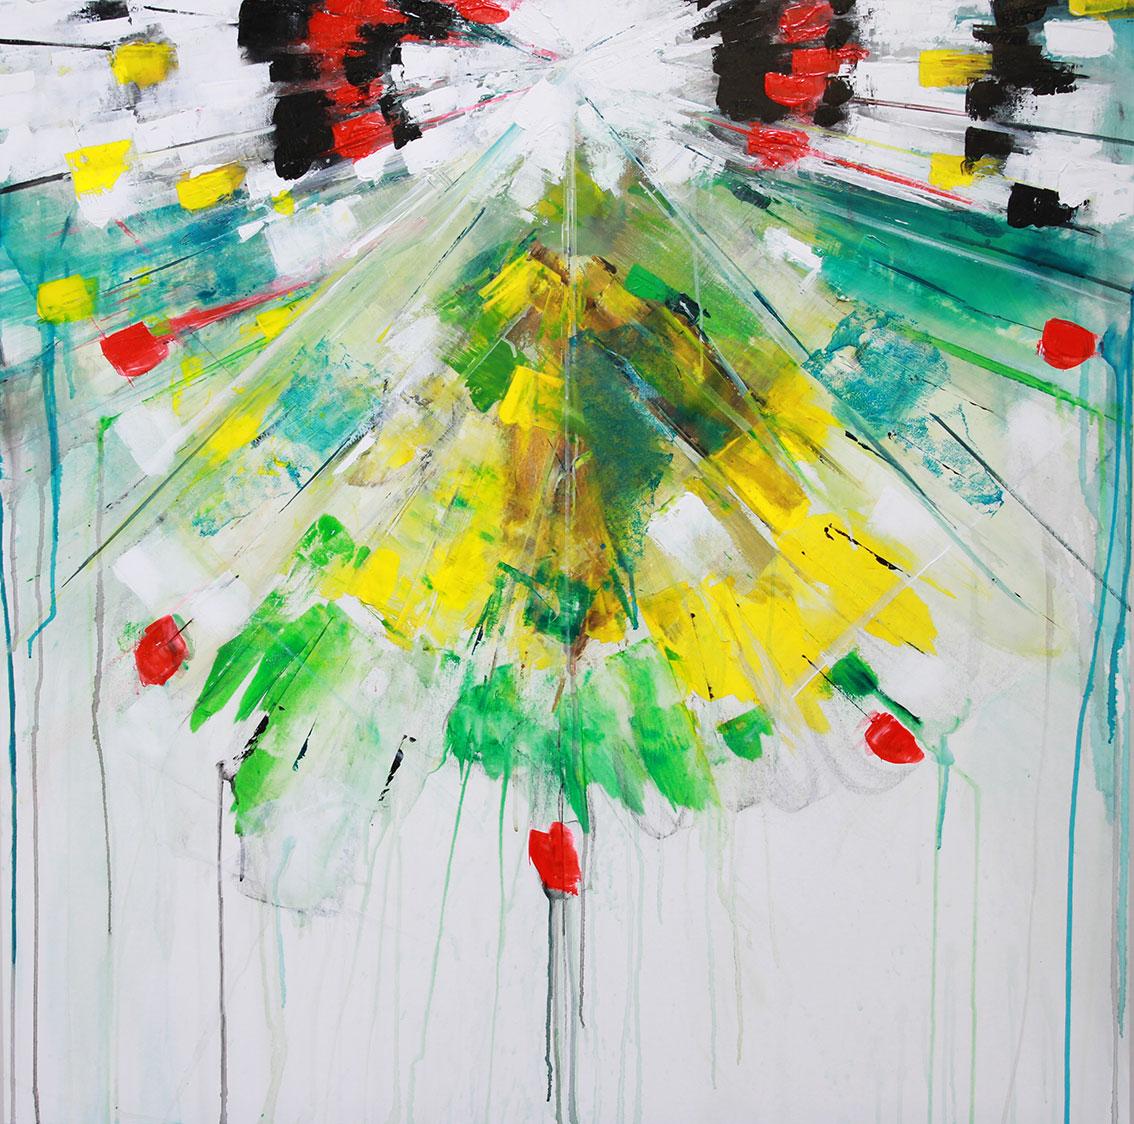 'The unexpected awake' 100 x 100 cm acrylic on canvas